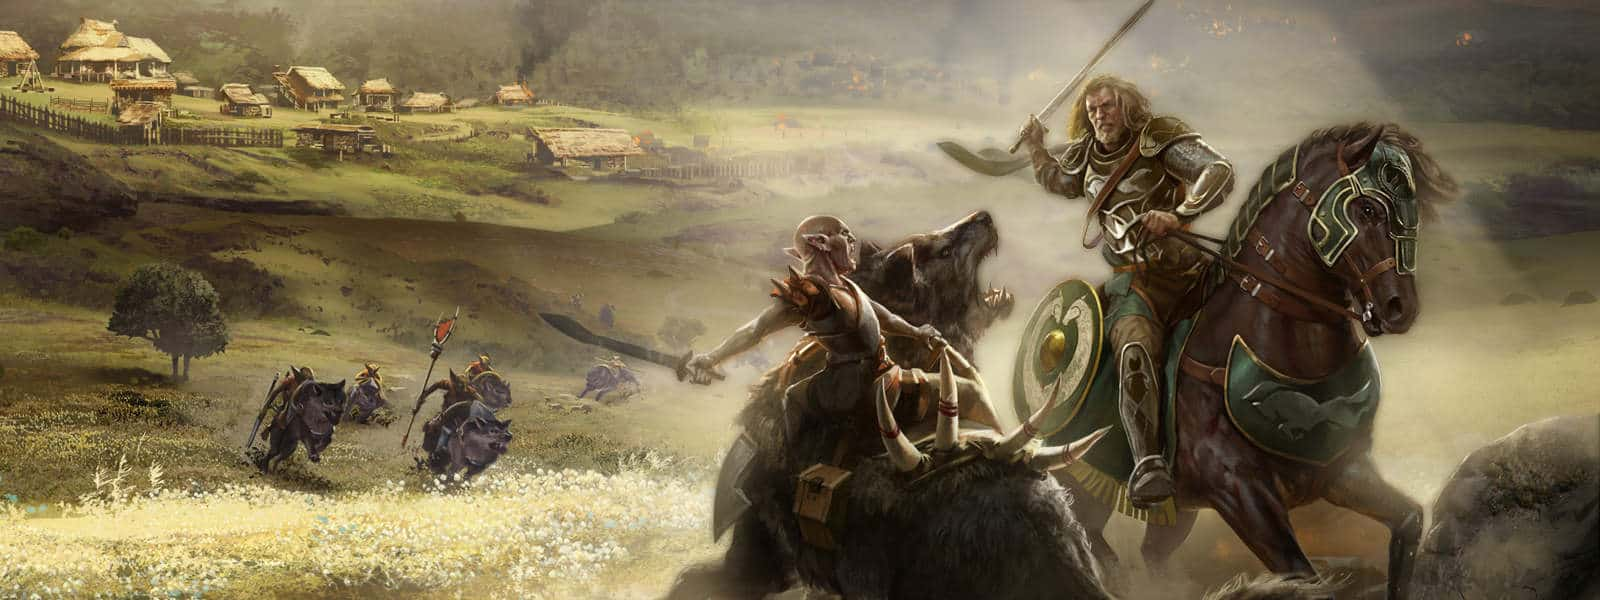 LOTRO Legendary Servers: Riders of Rohan 6